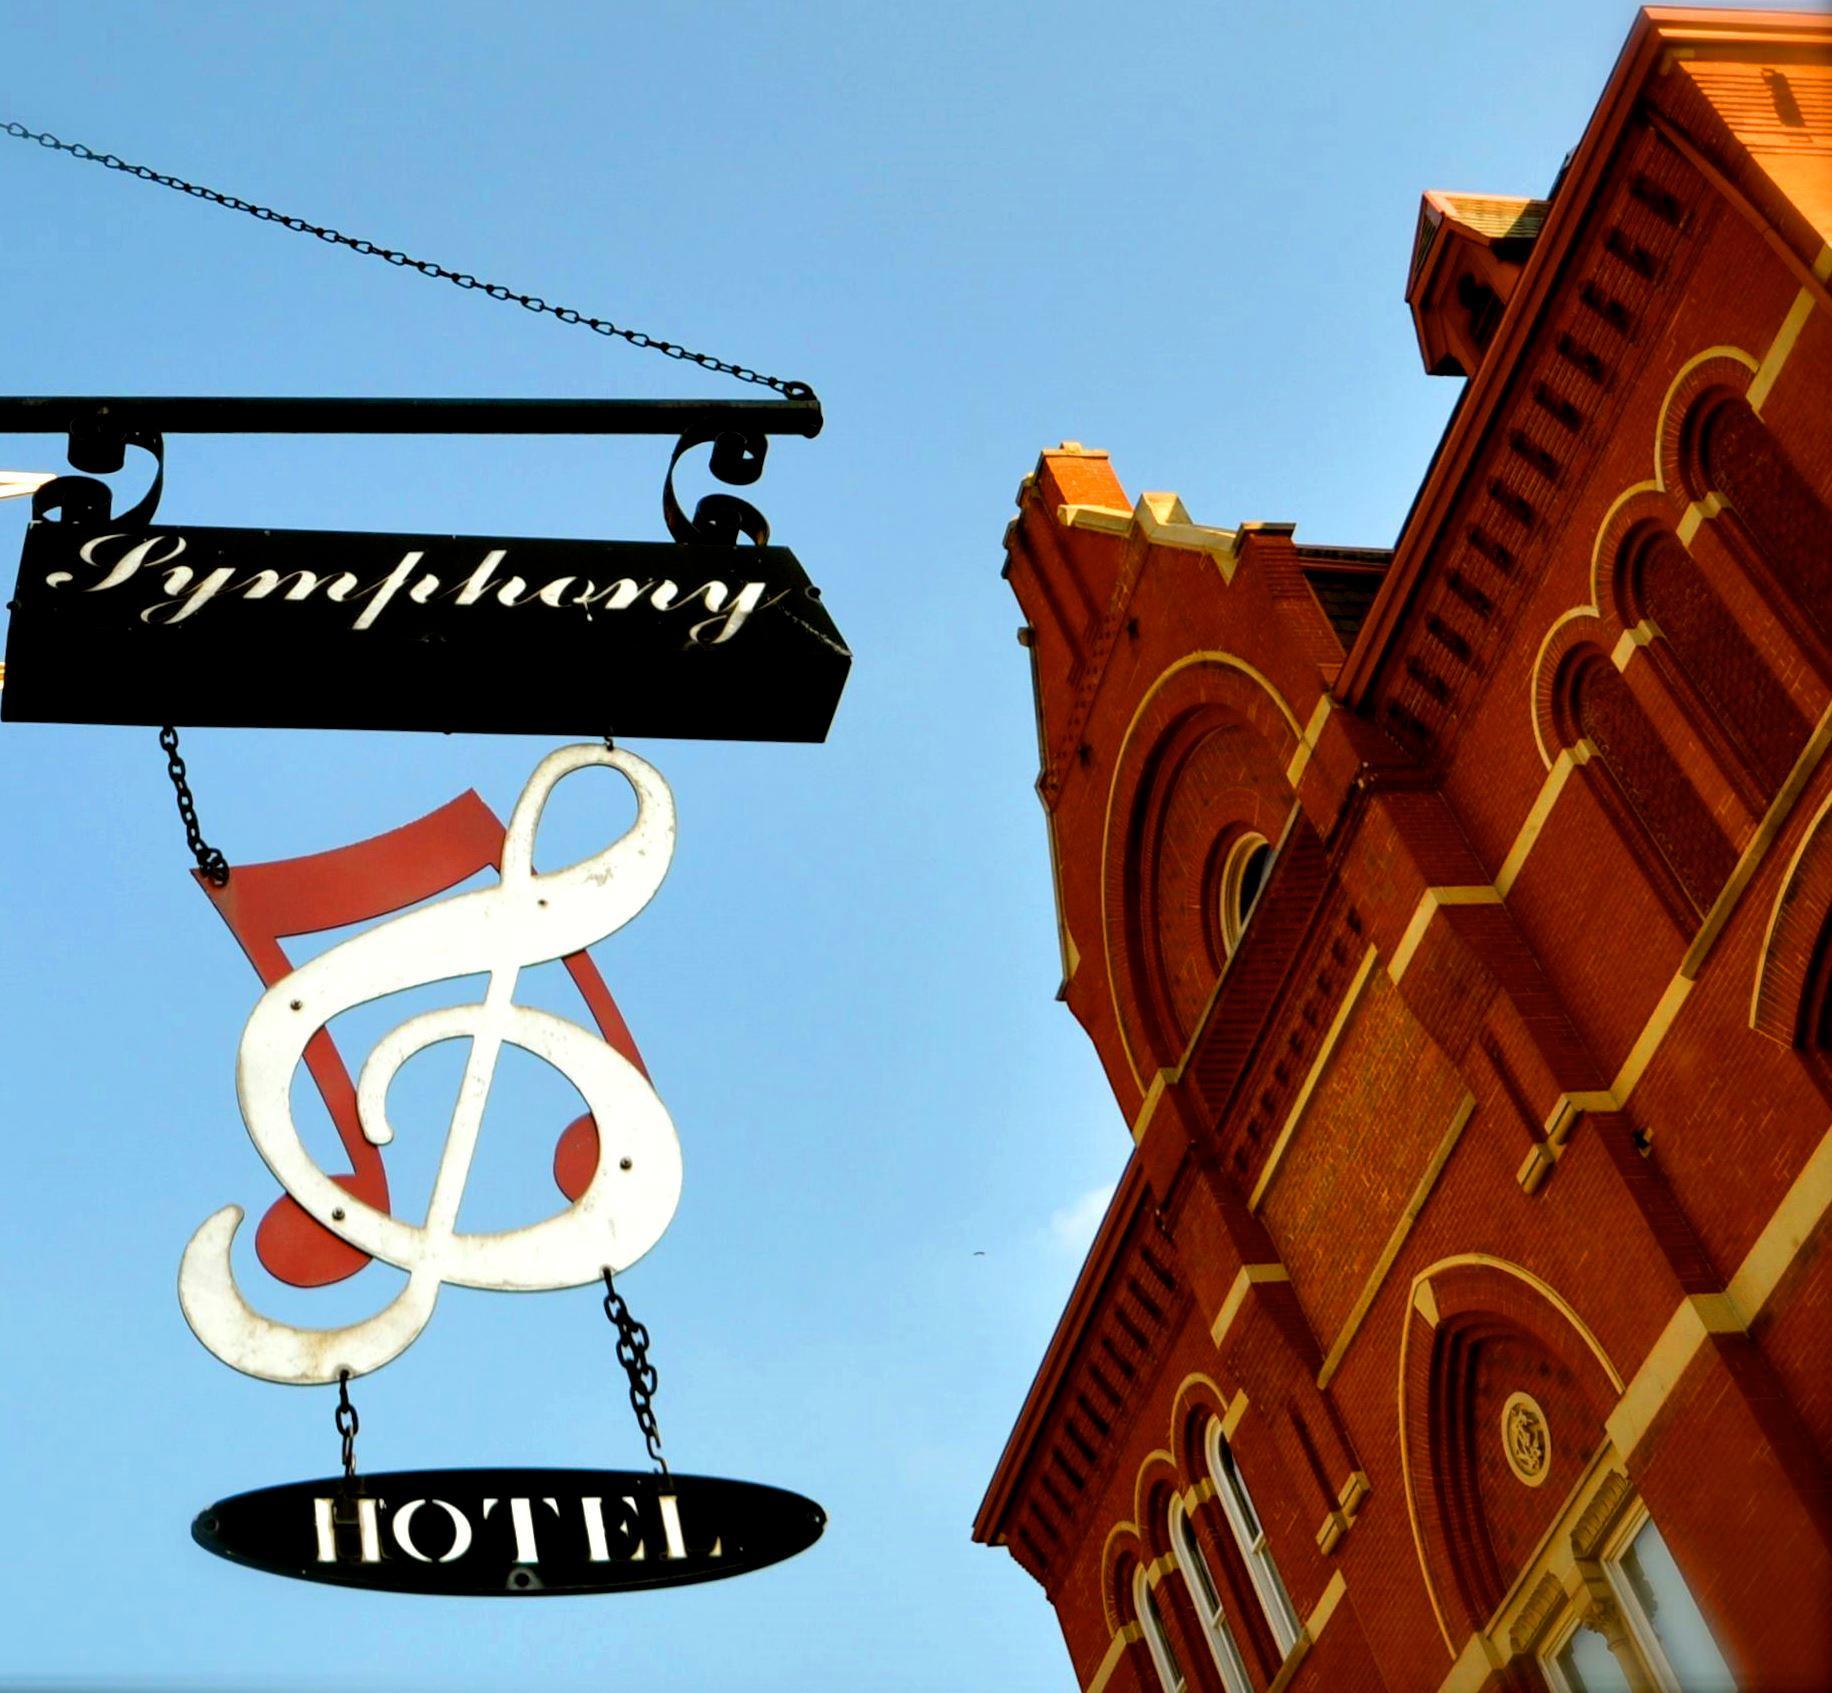 Symphony Hotel & Restaurant image 1